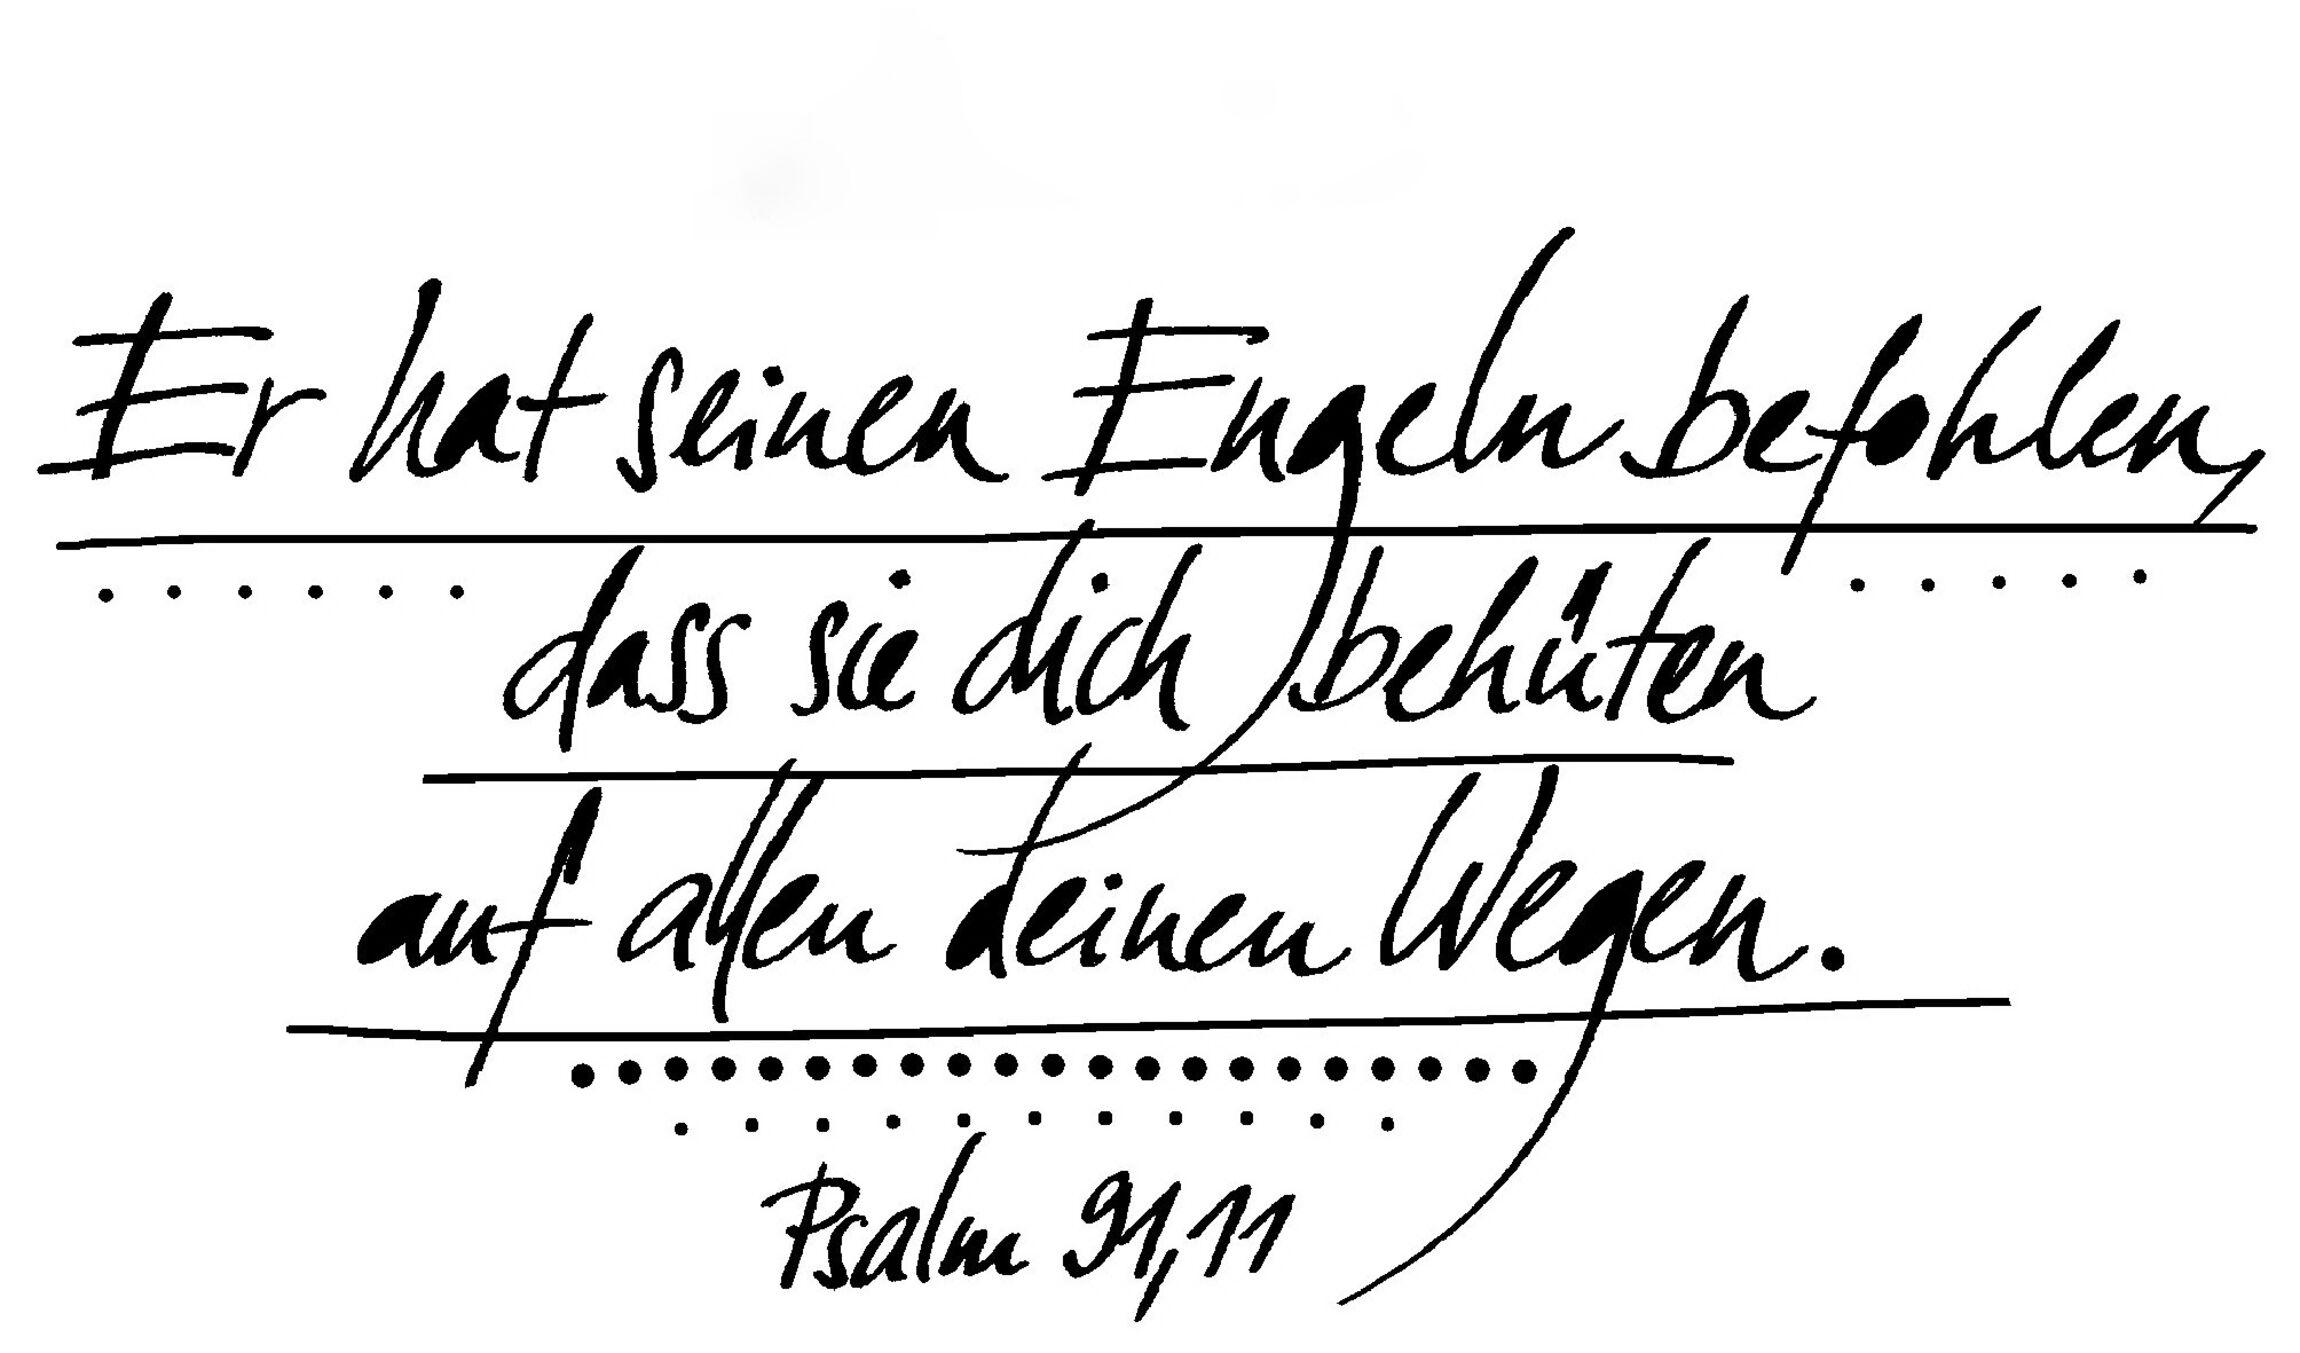 Schutzengel - Psalm 91,11